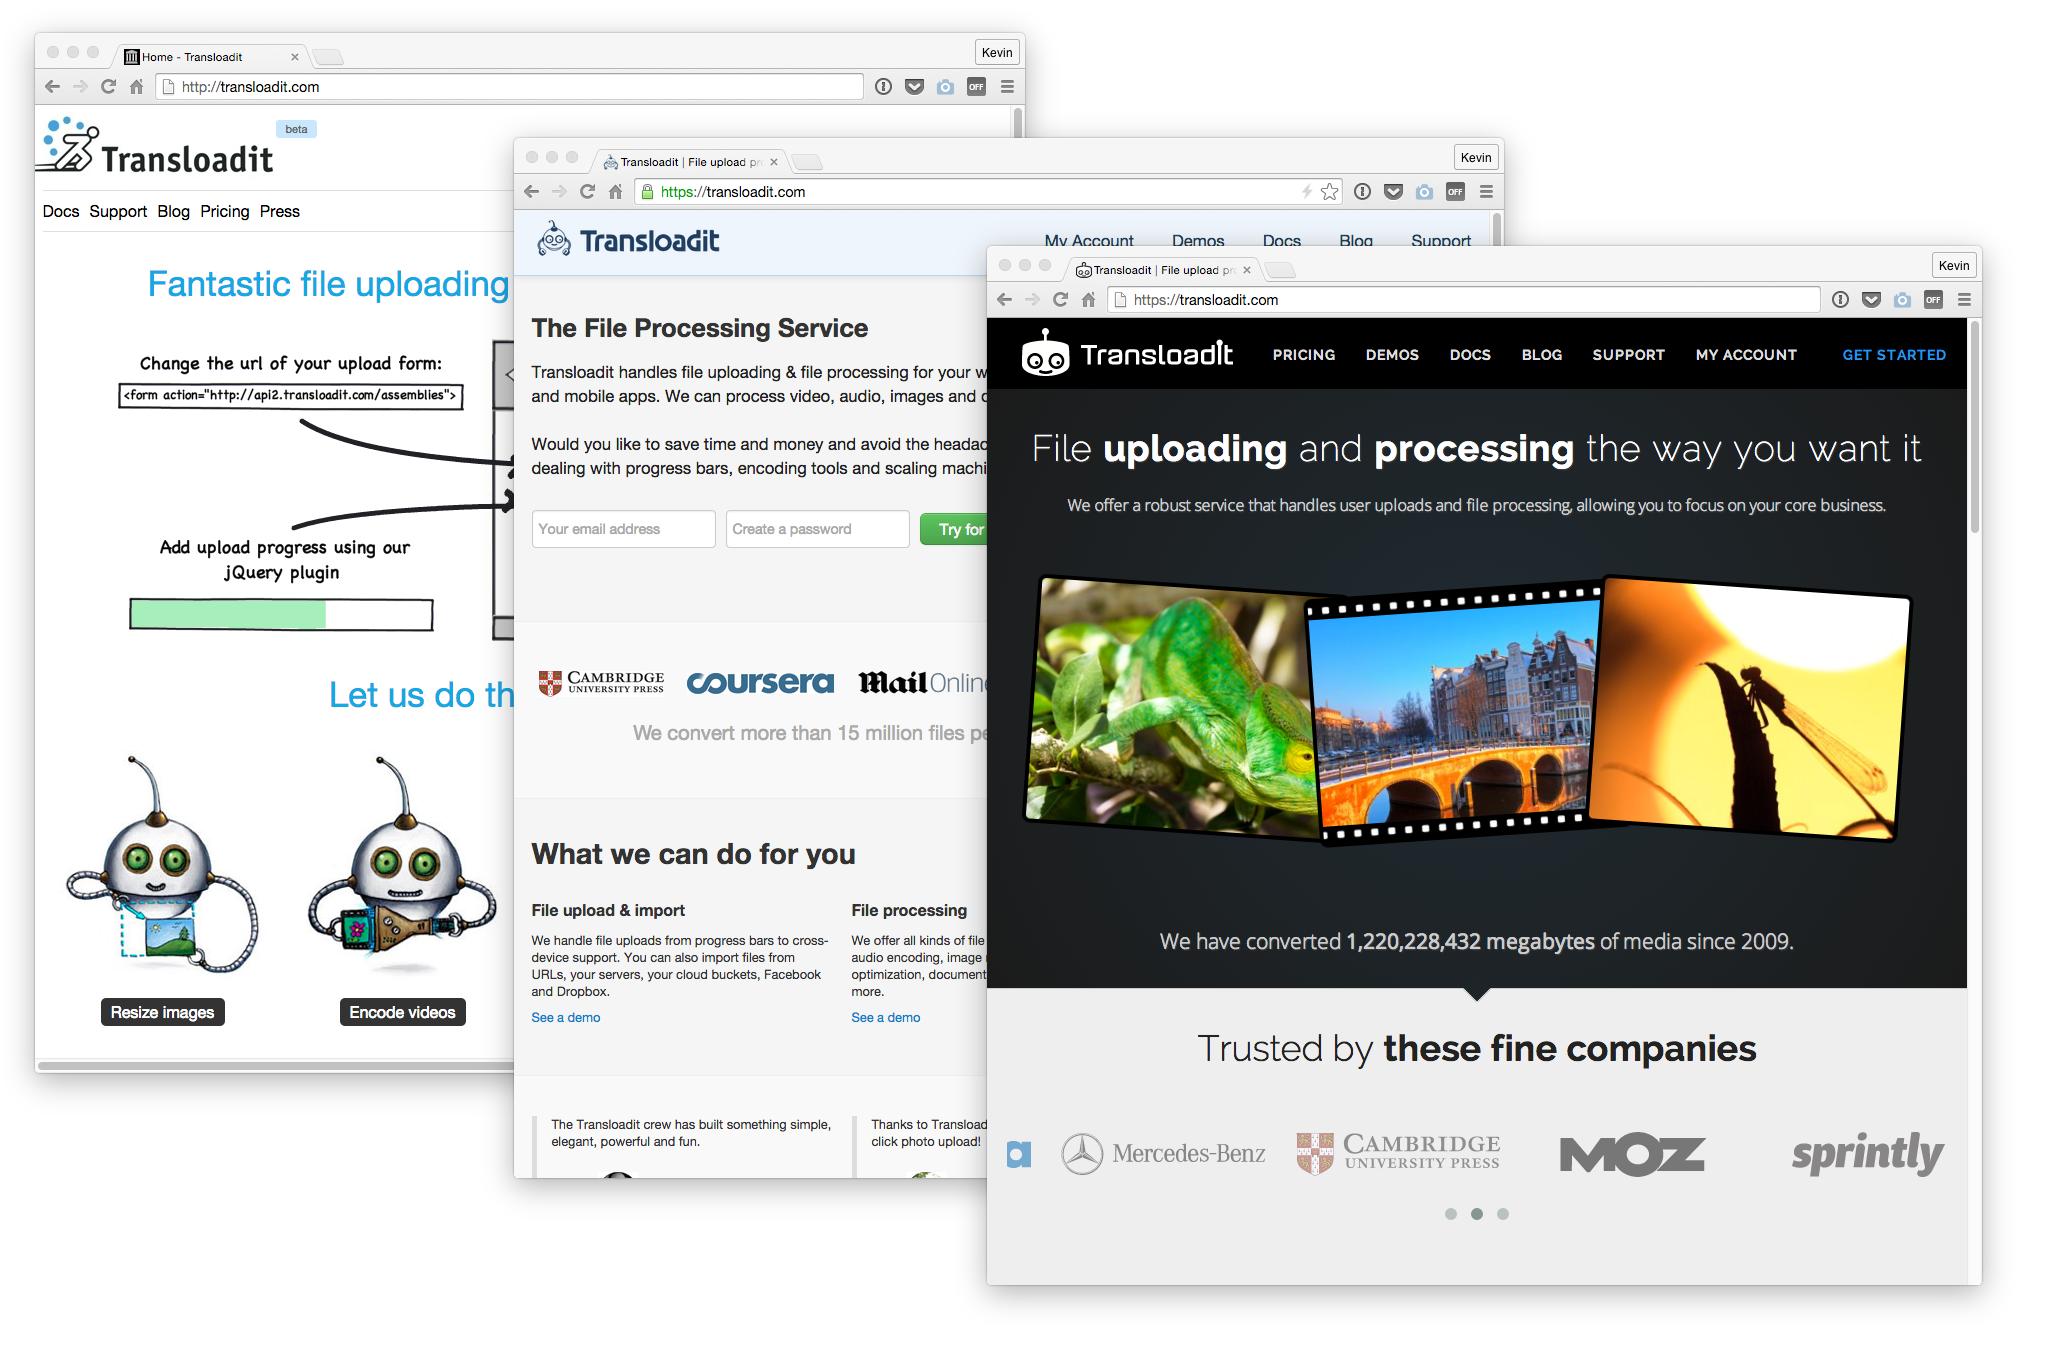 Transloadit website in 2009, 2012, 2015